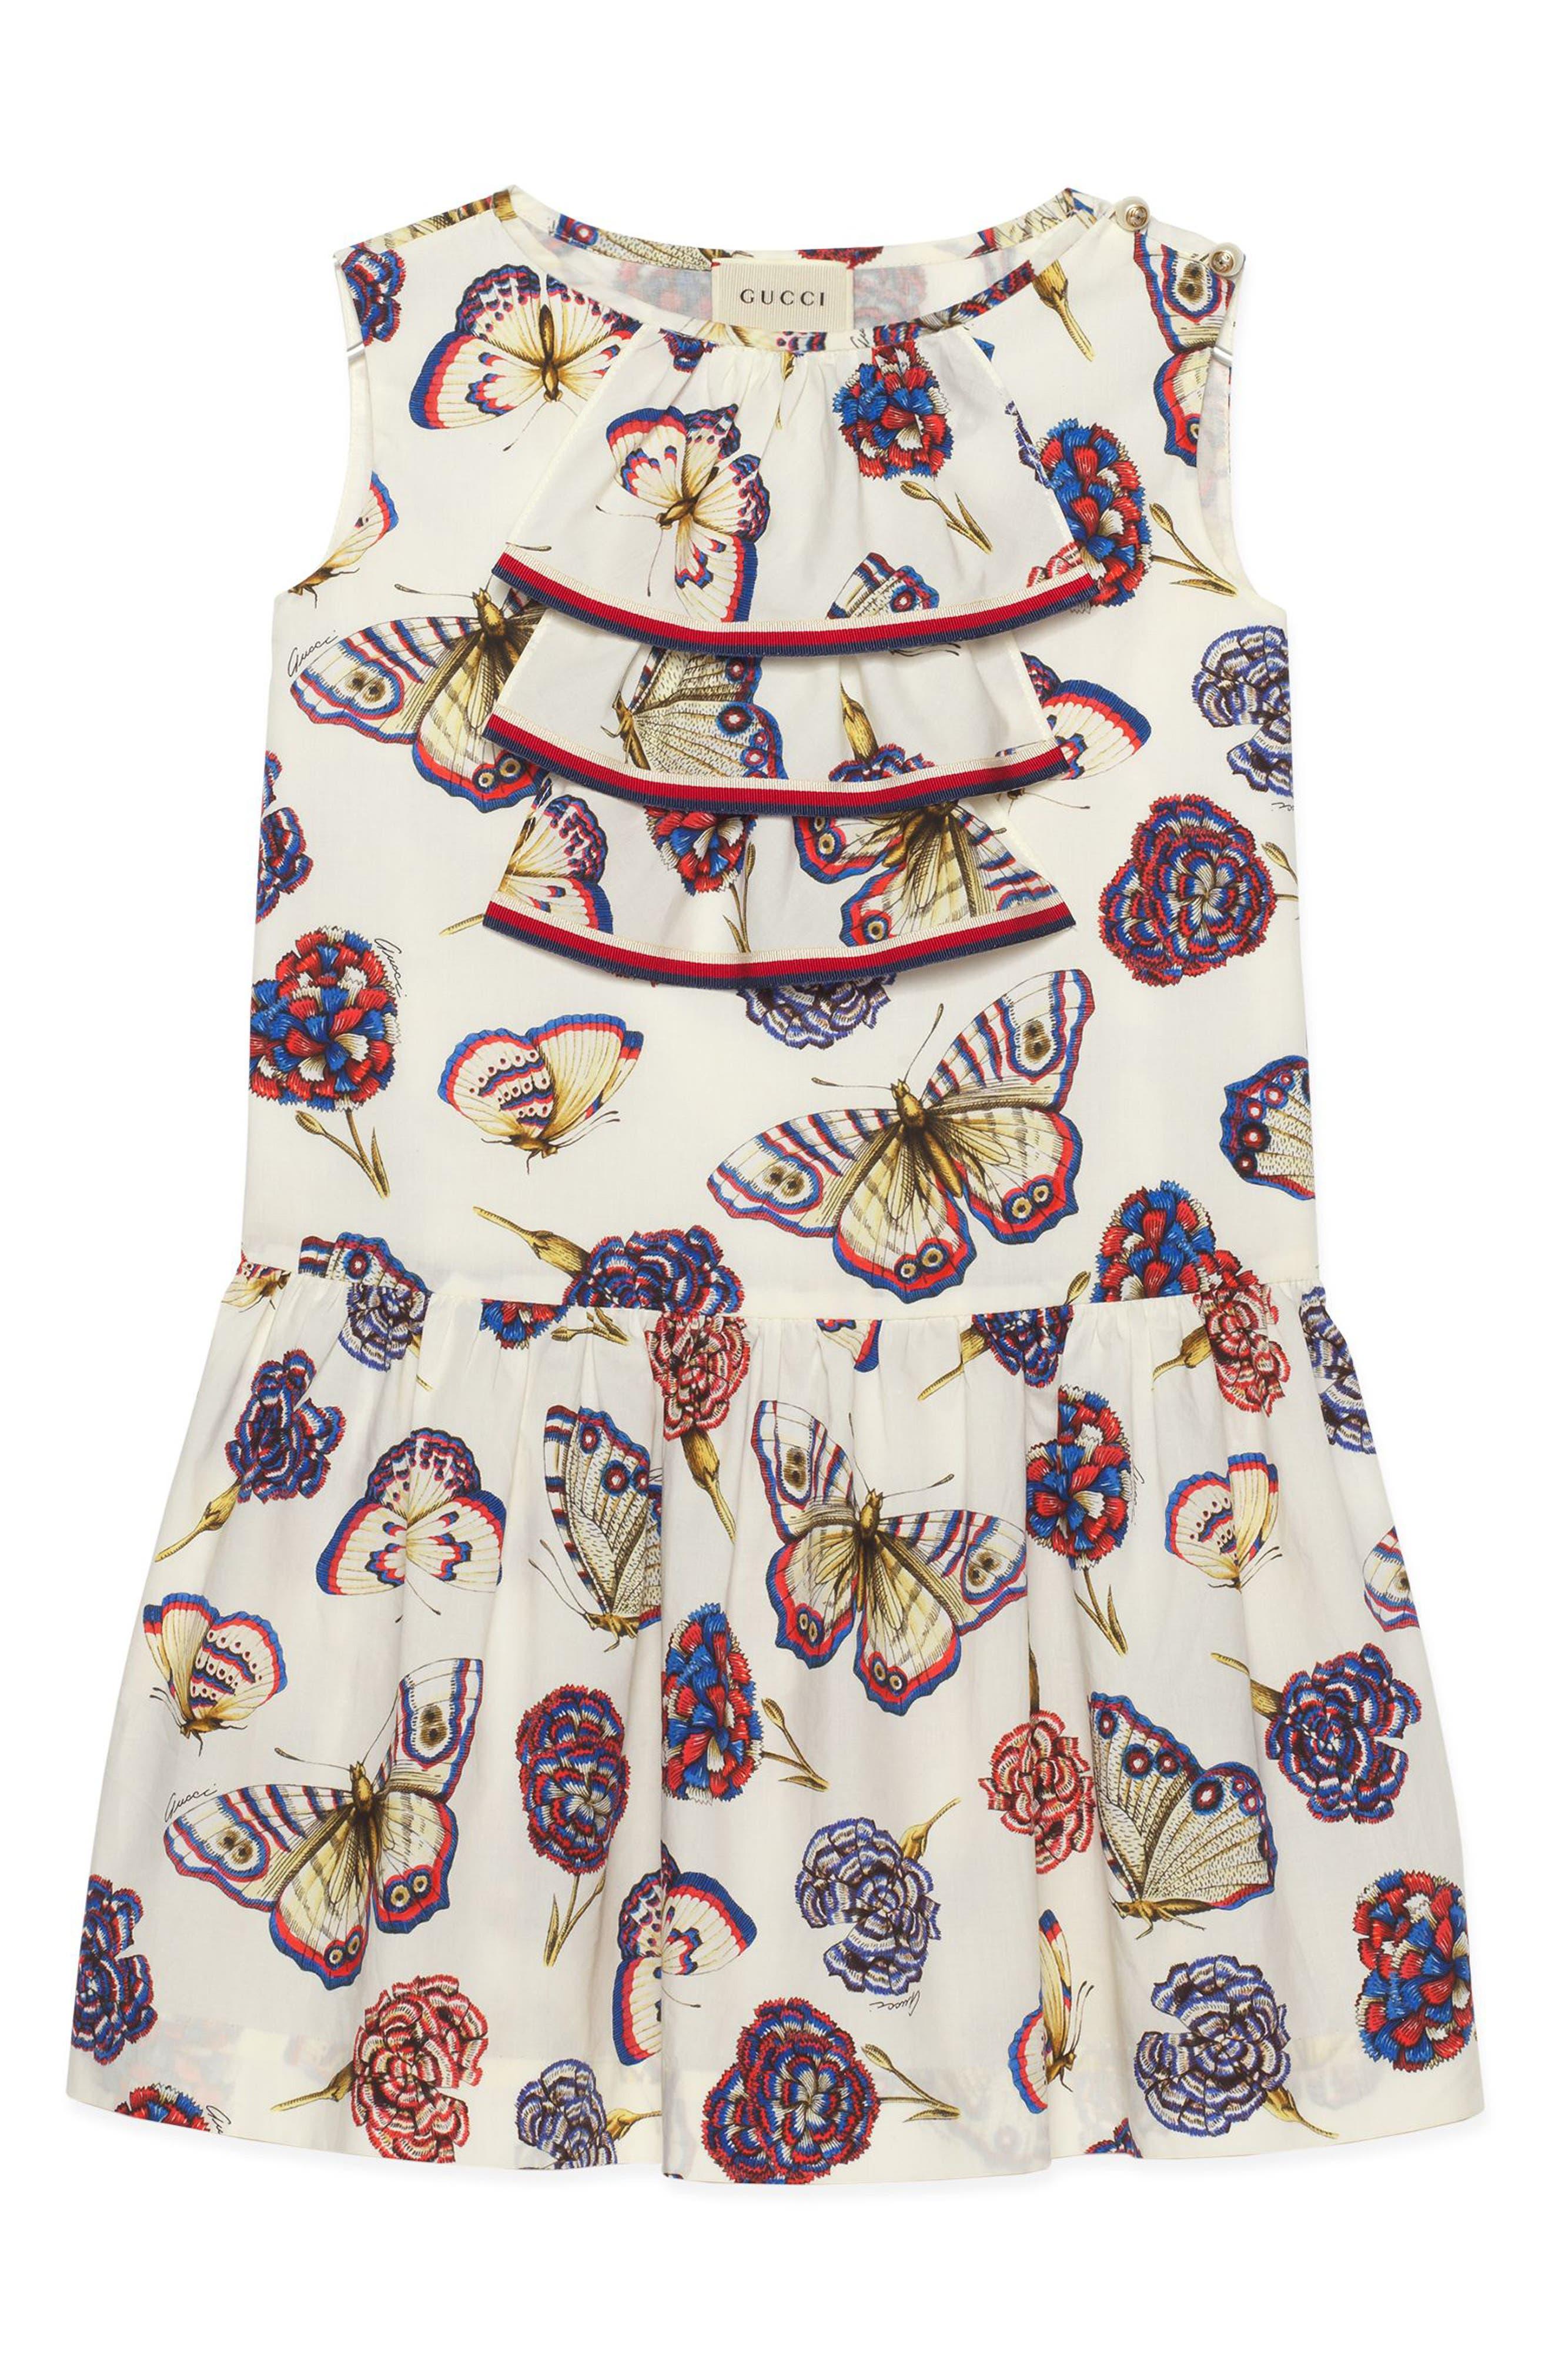 Alternate Image 1 Selected - Gucci Butterfly Ruffle Dress (Little Girls & Big Girls)